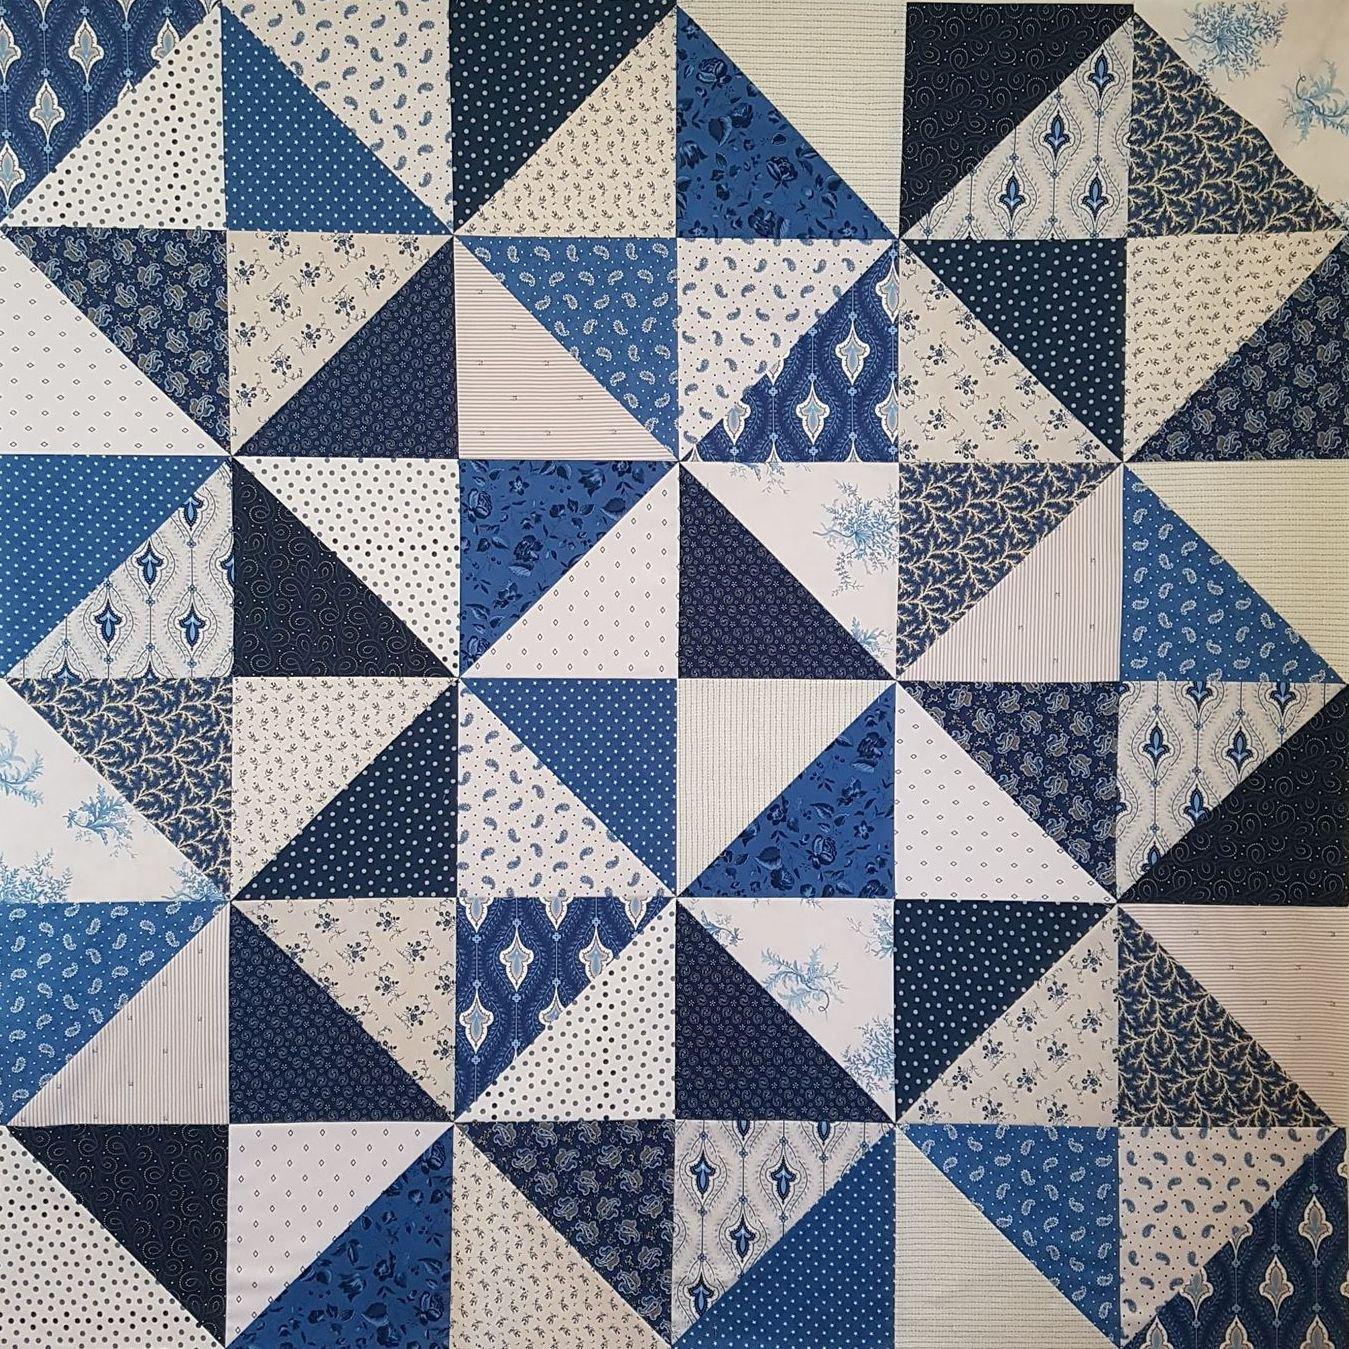 'Amour Bleu' Quilt Kit